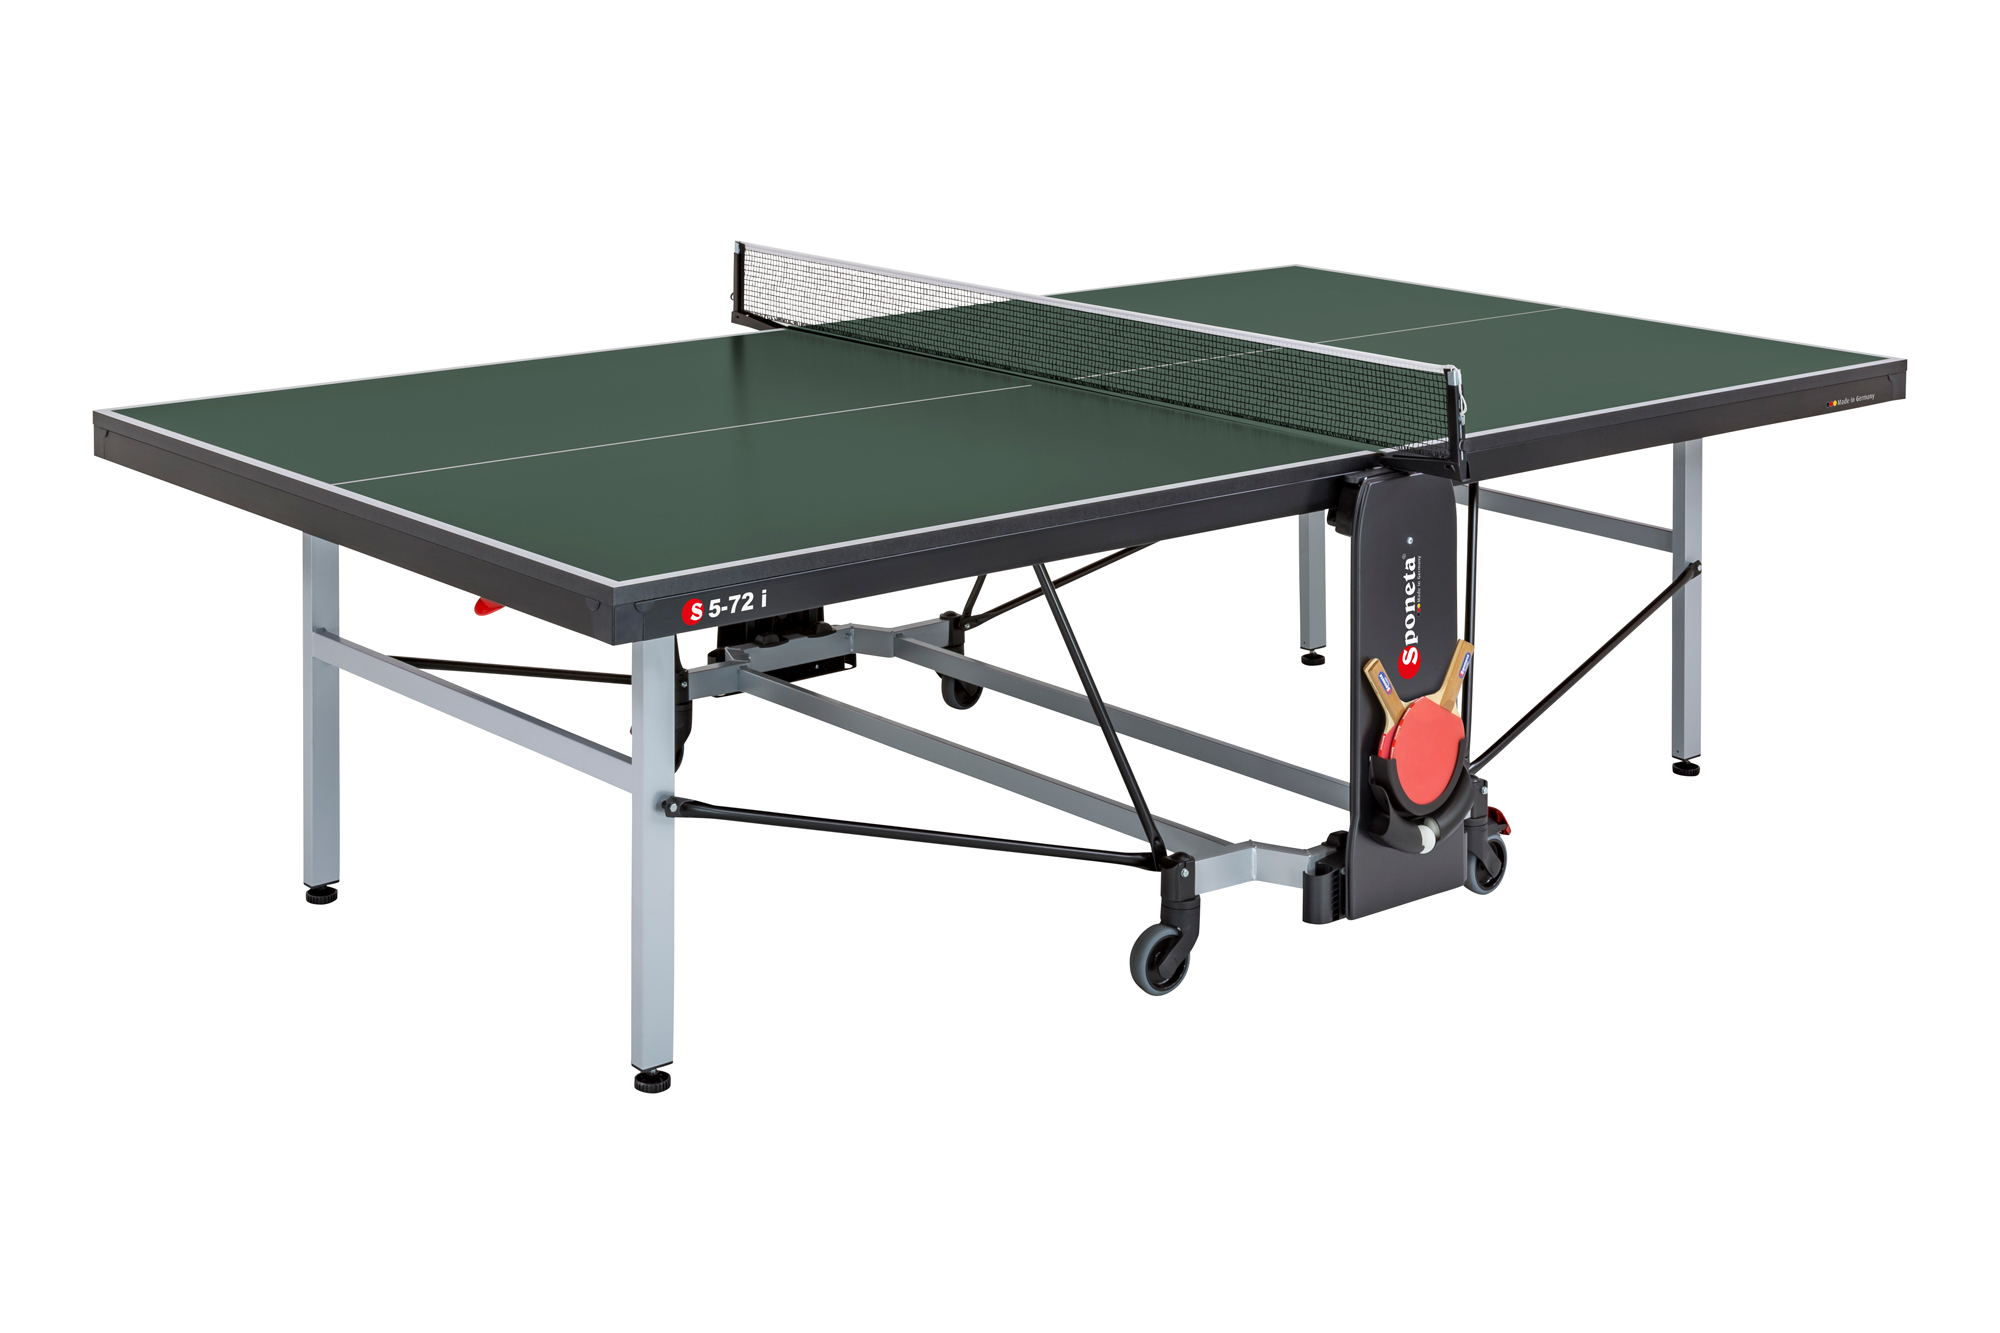 Sponeta S5-72i tafeltennistafel schoolline compact plus groen